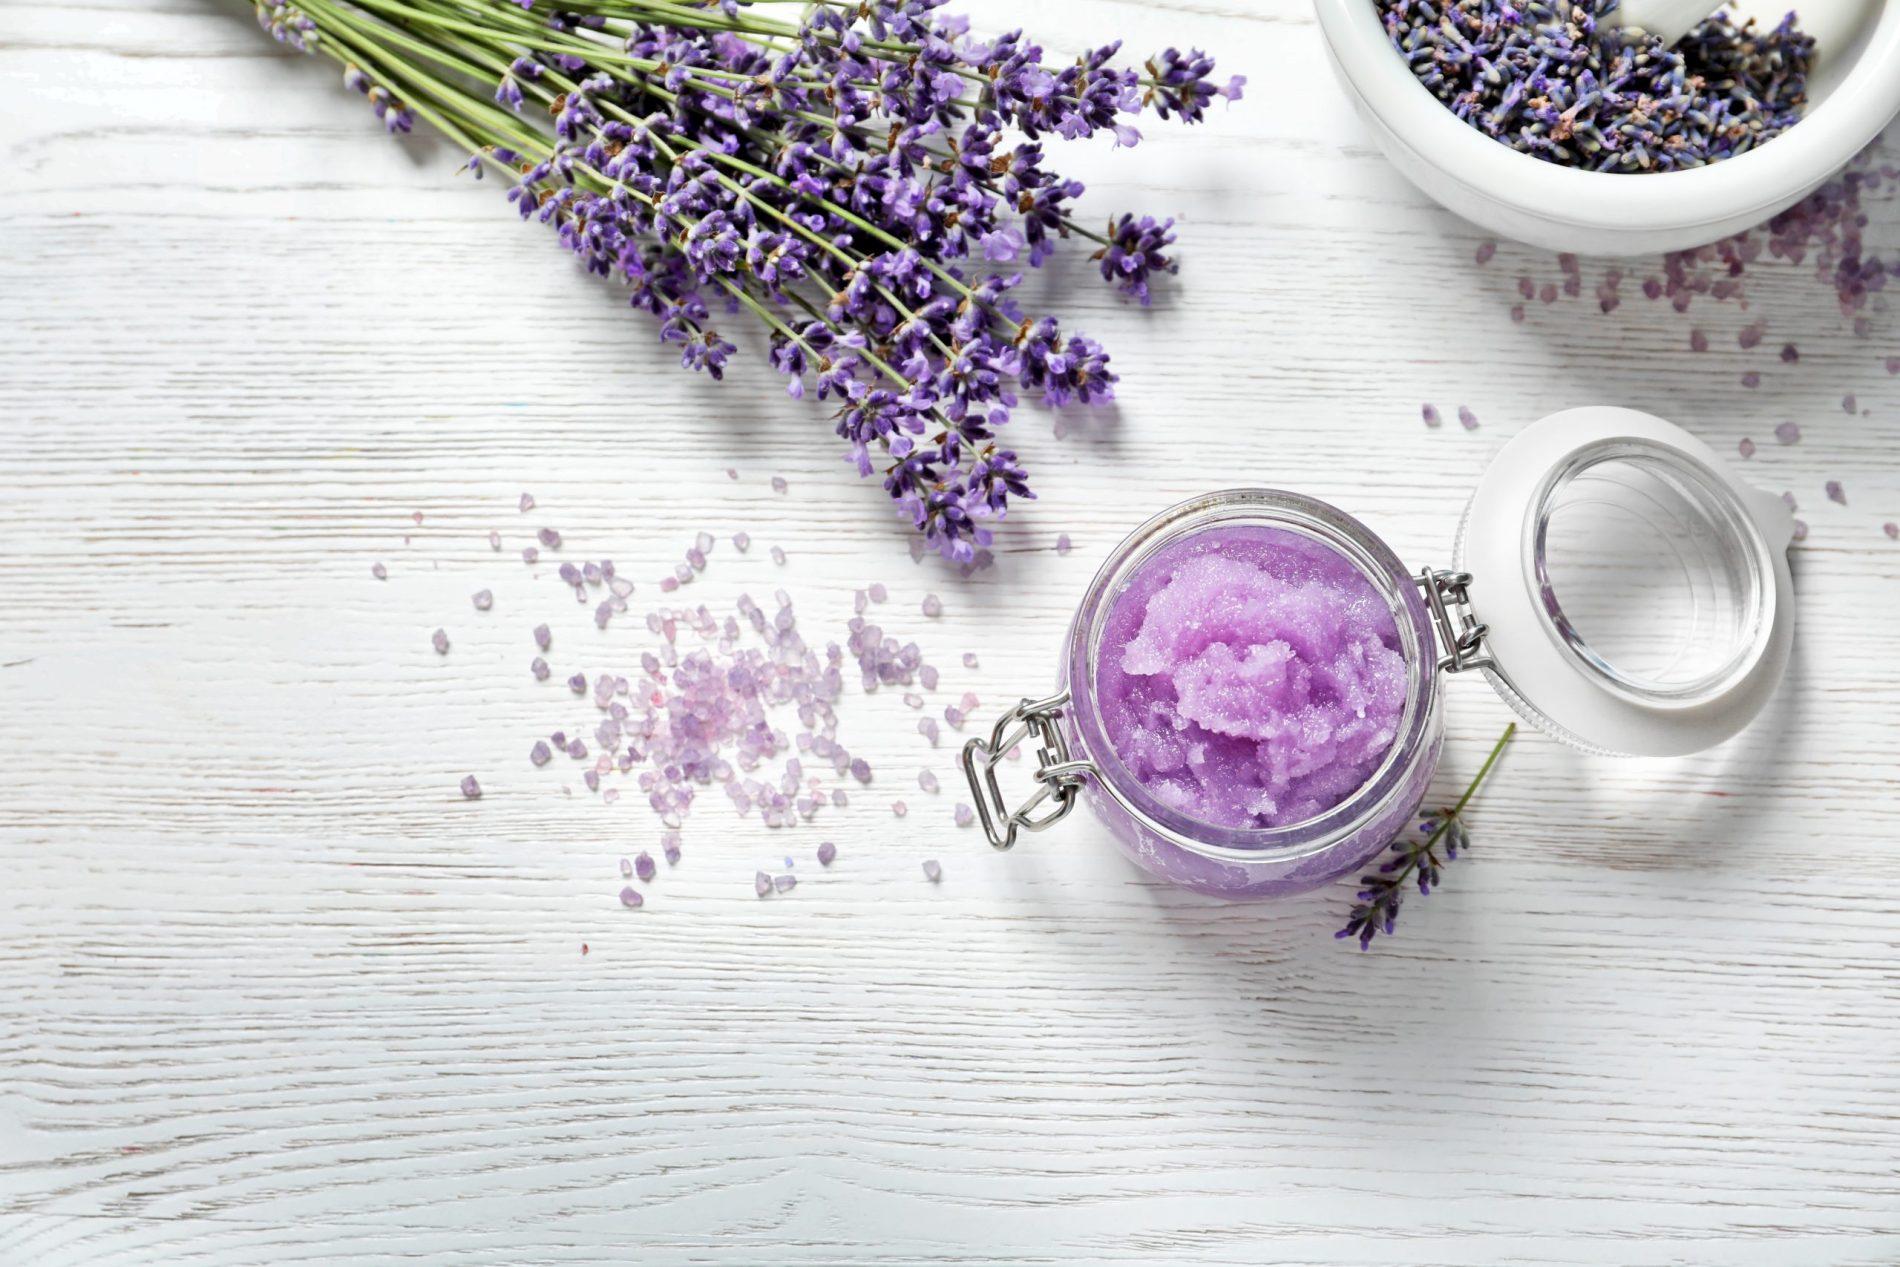 DIY Natural Sugar Body Scrub with Lavender Flowers